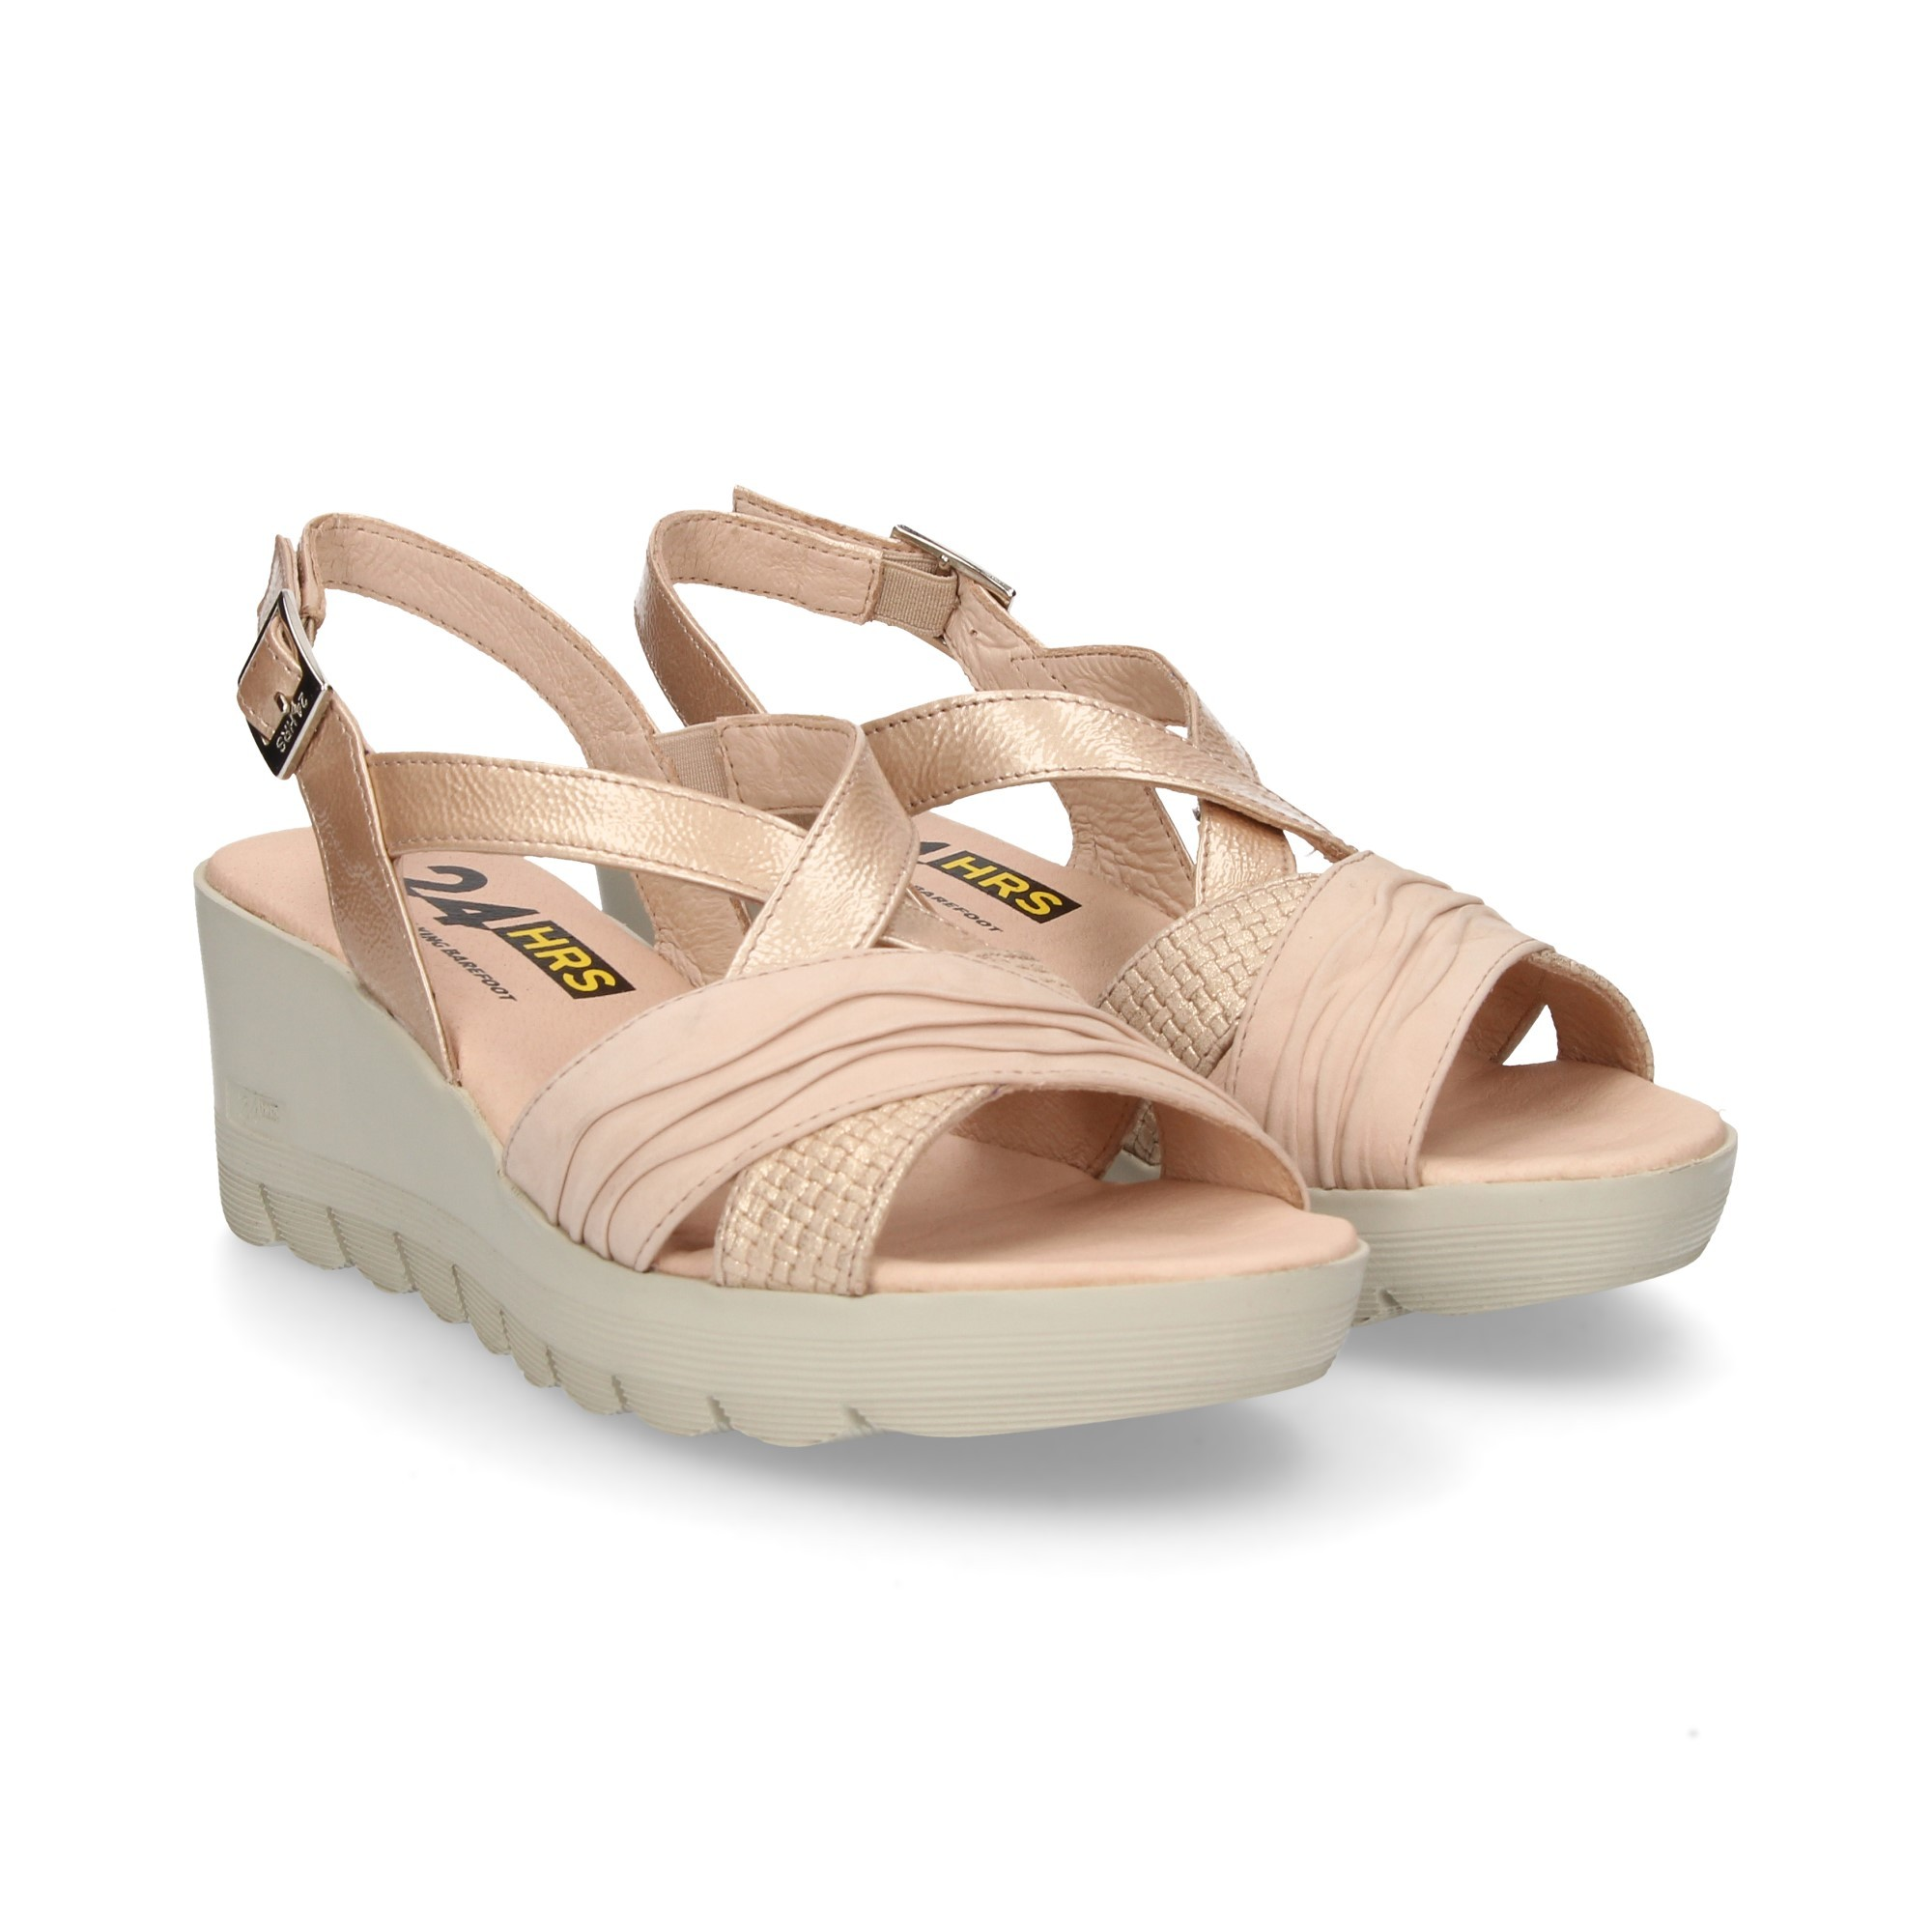 heures de femmes femmes femmes est wedge sandales   arce nu 9b08ce